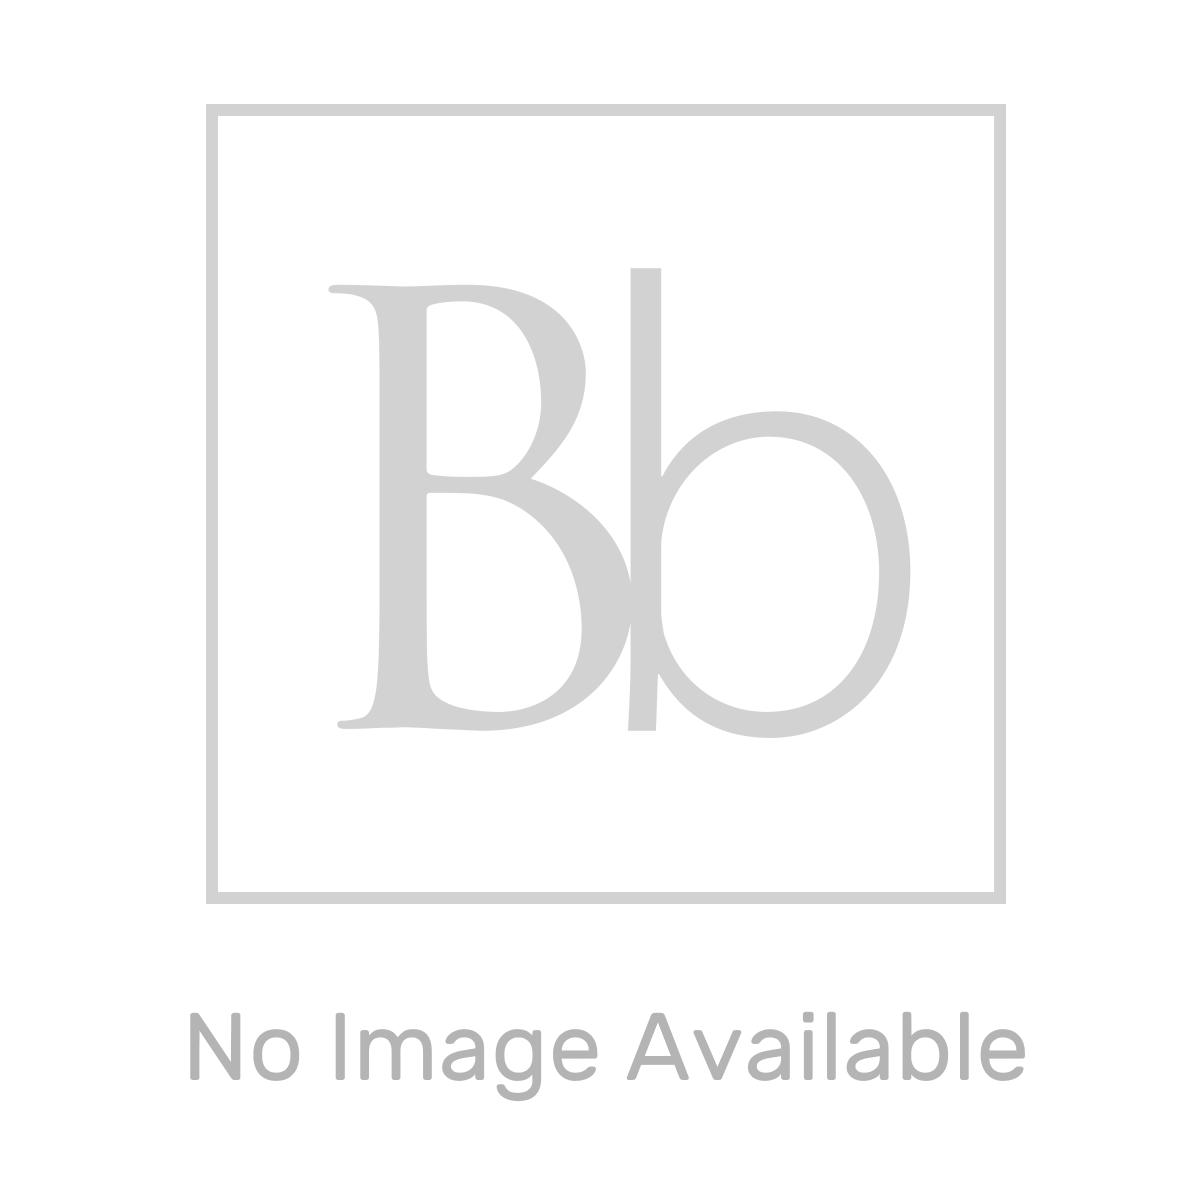 Nuie Athena Gloss Grey 2 Door Floor Standing Unit 500mm with Minimalist Basin Dimension